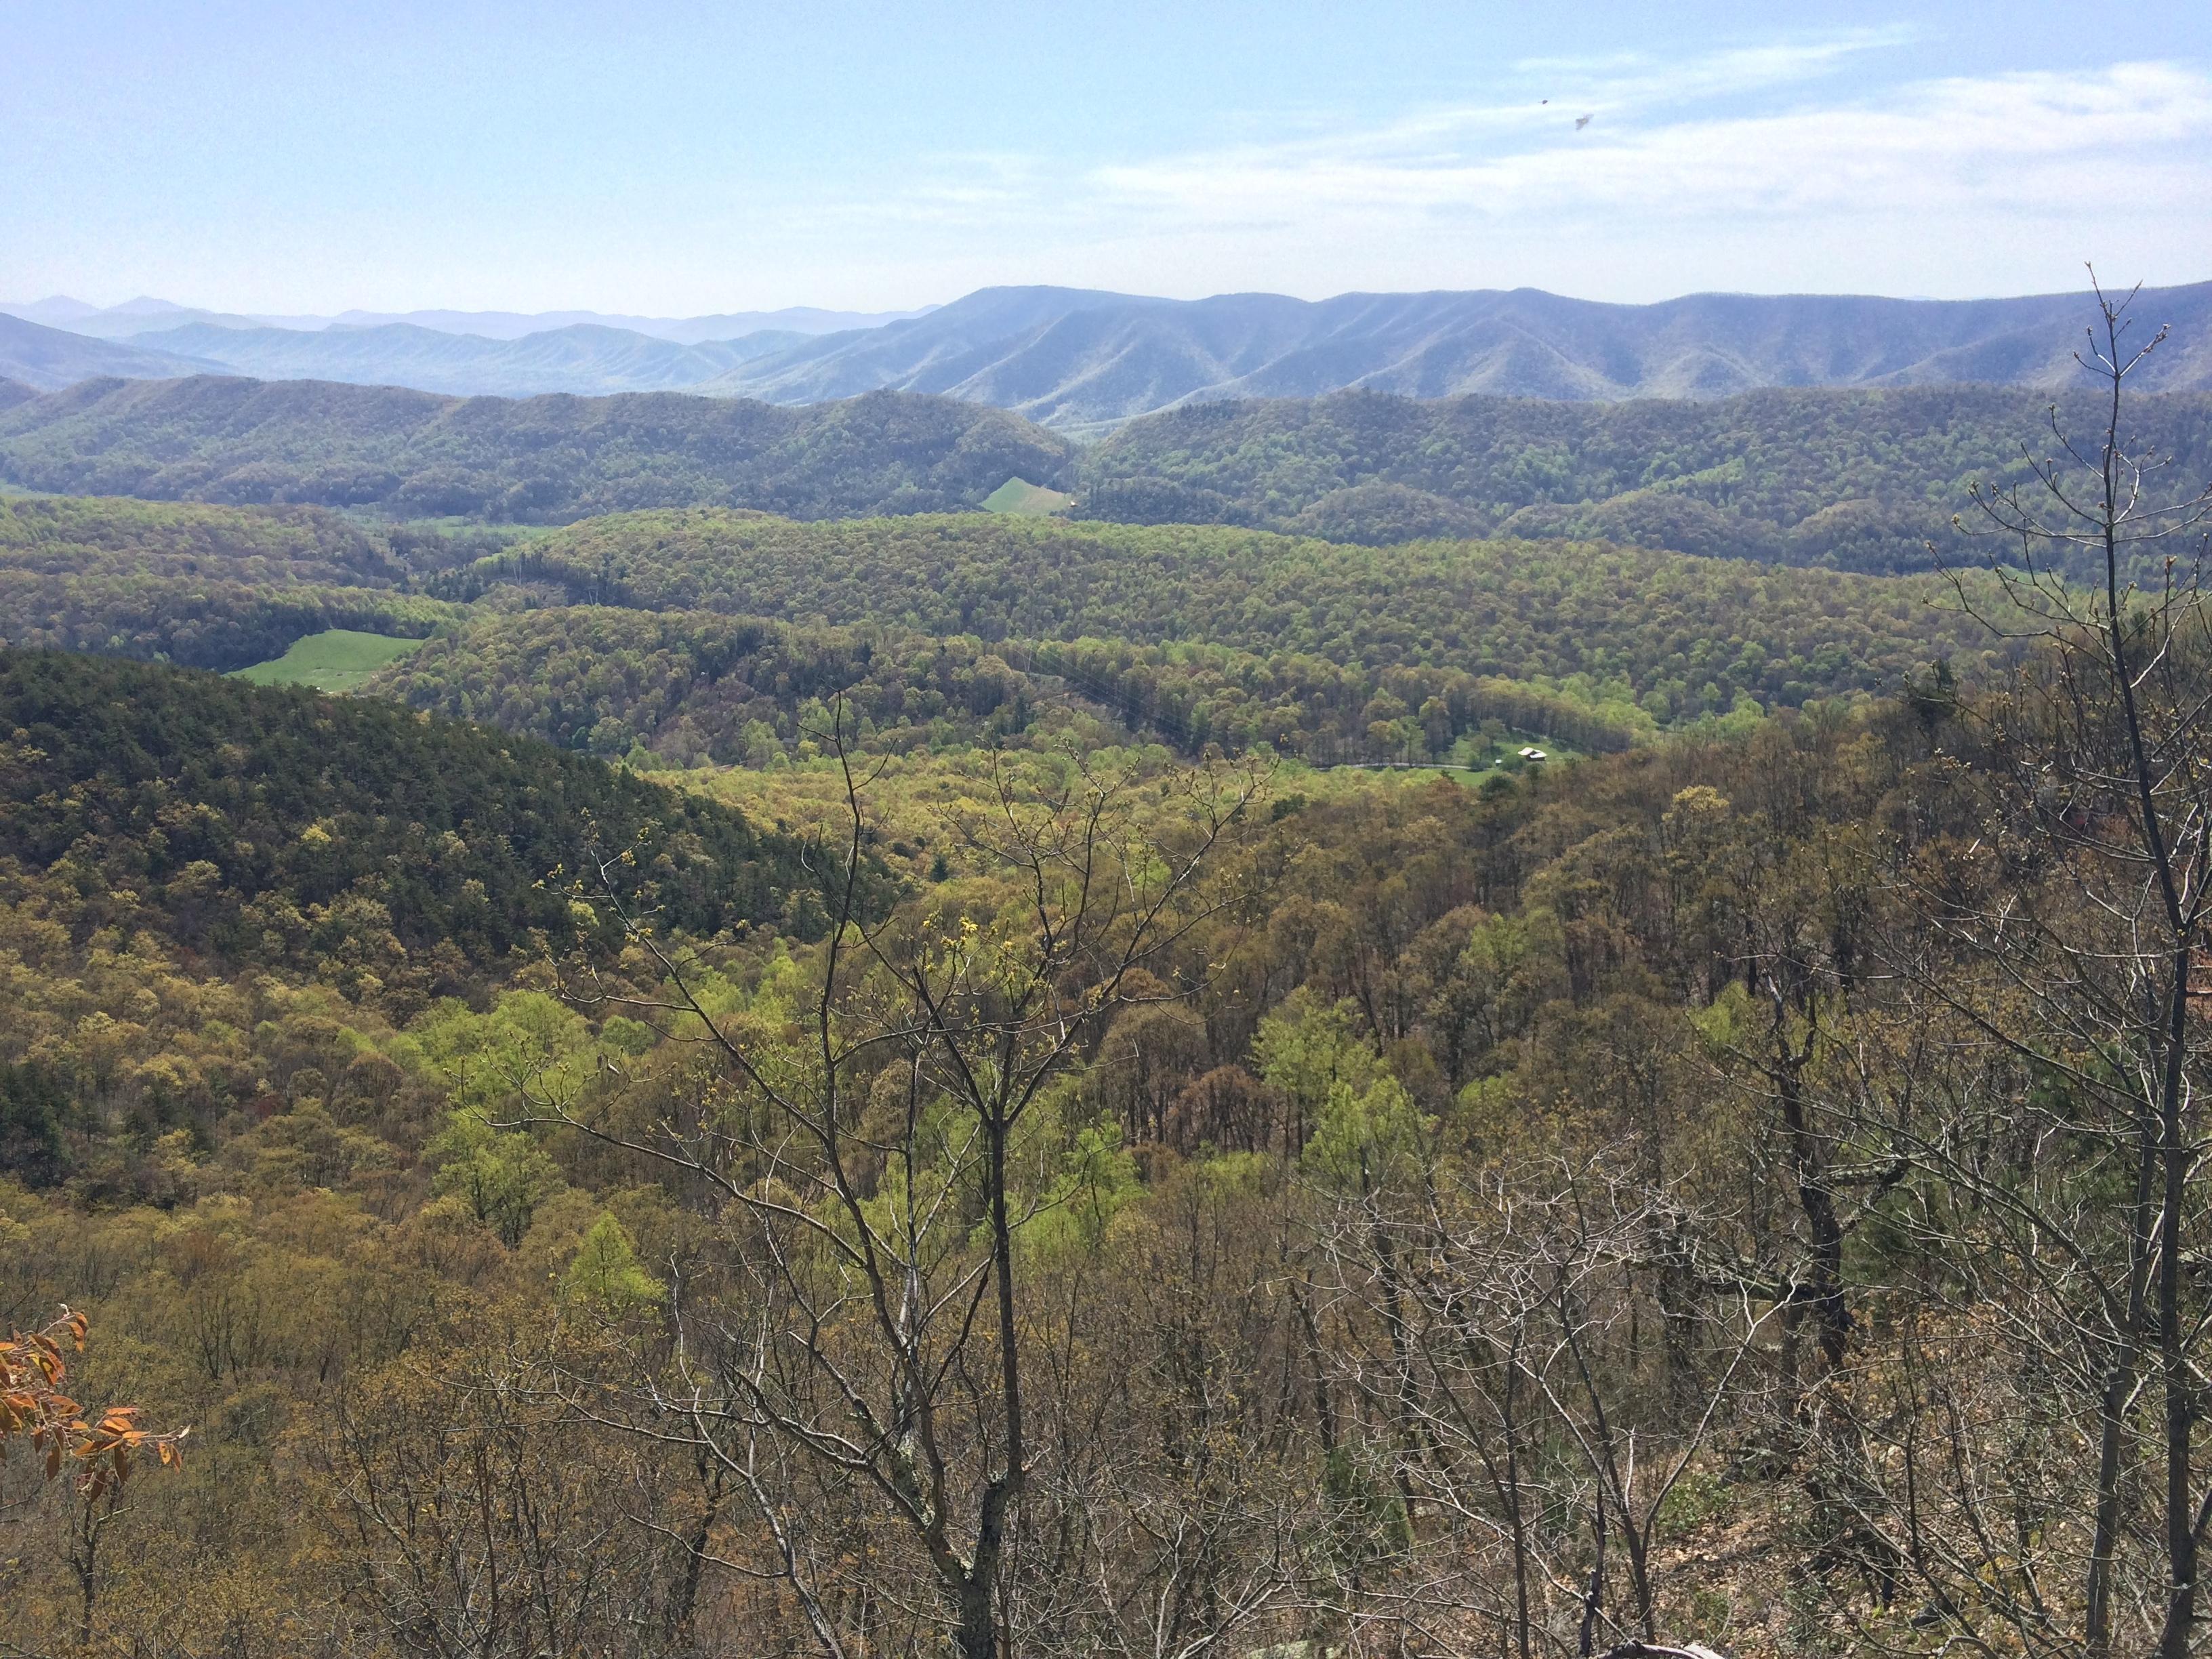 Slain Hiker Identified, Details Emerge About Appalachian Trail Attack - The Trek